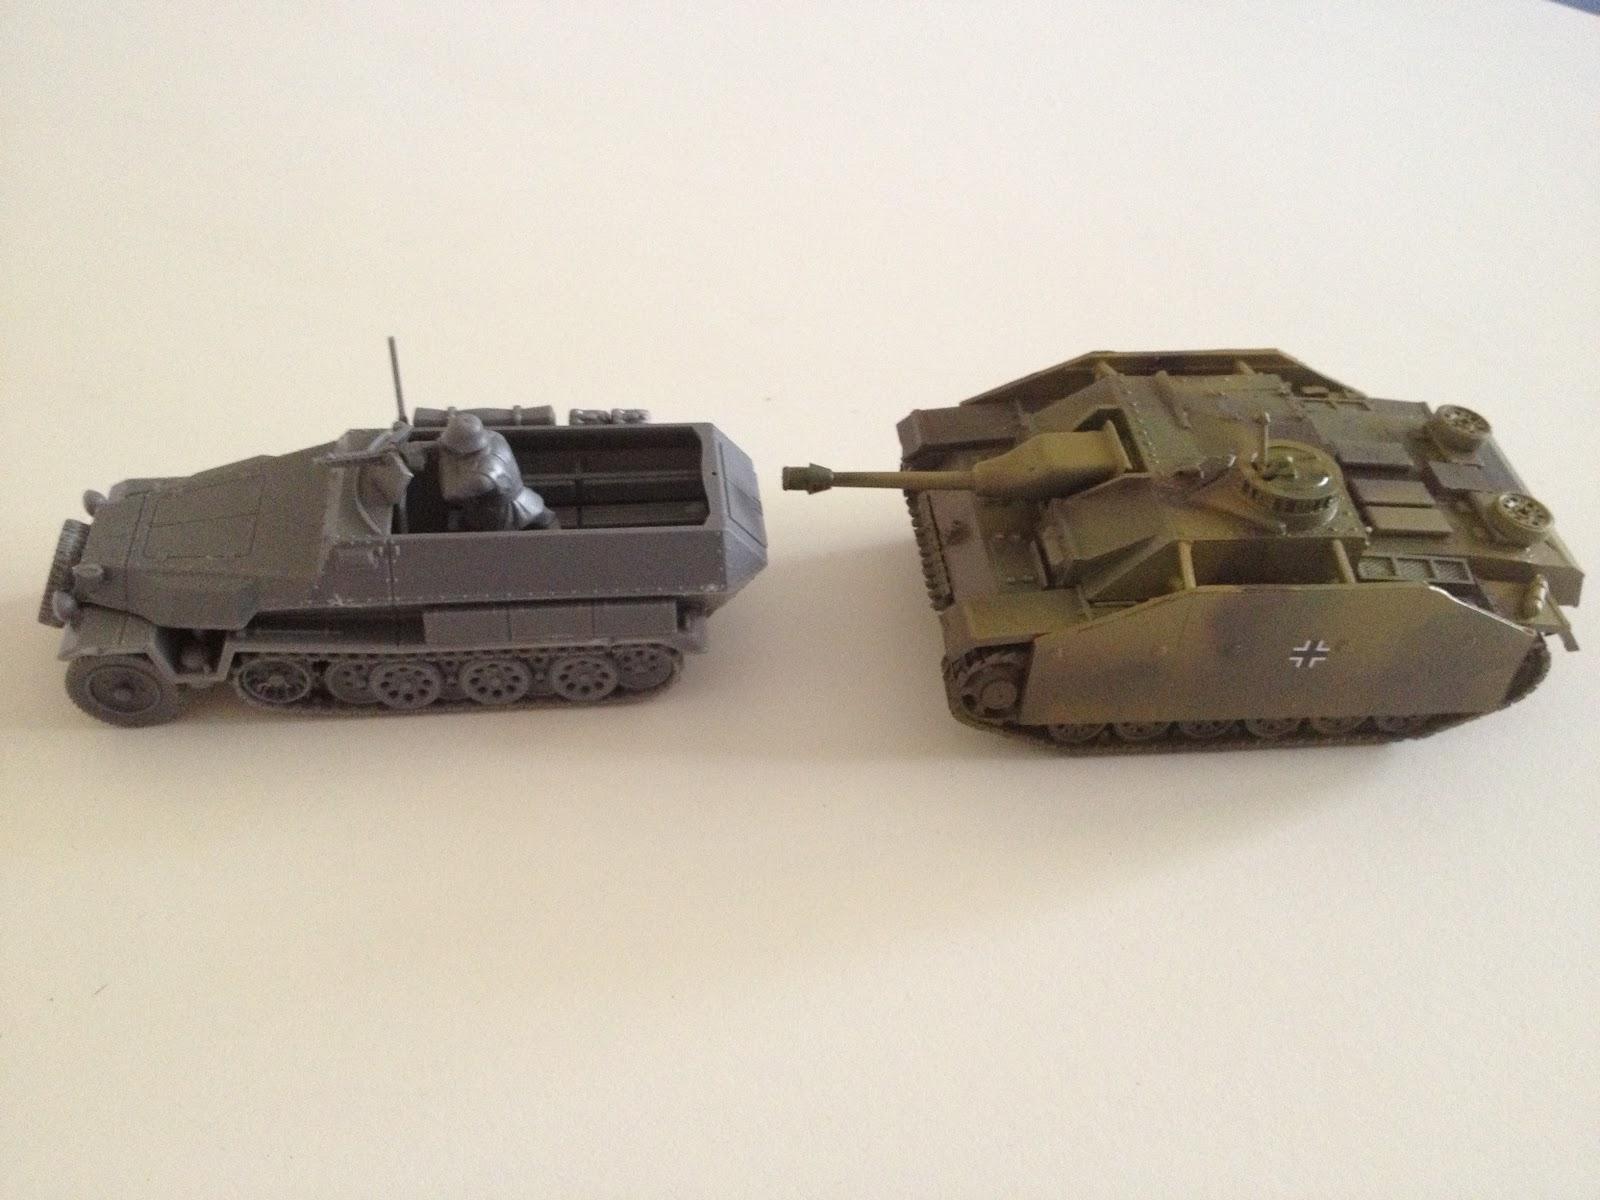 Vue de côté: comparaison Sdkfz 251/1 - Stug III ausf G